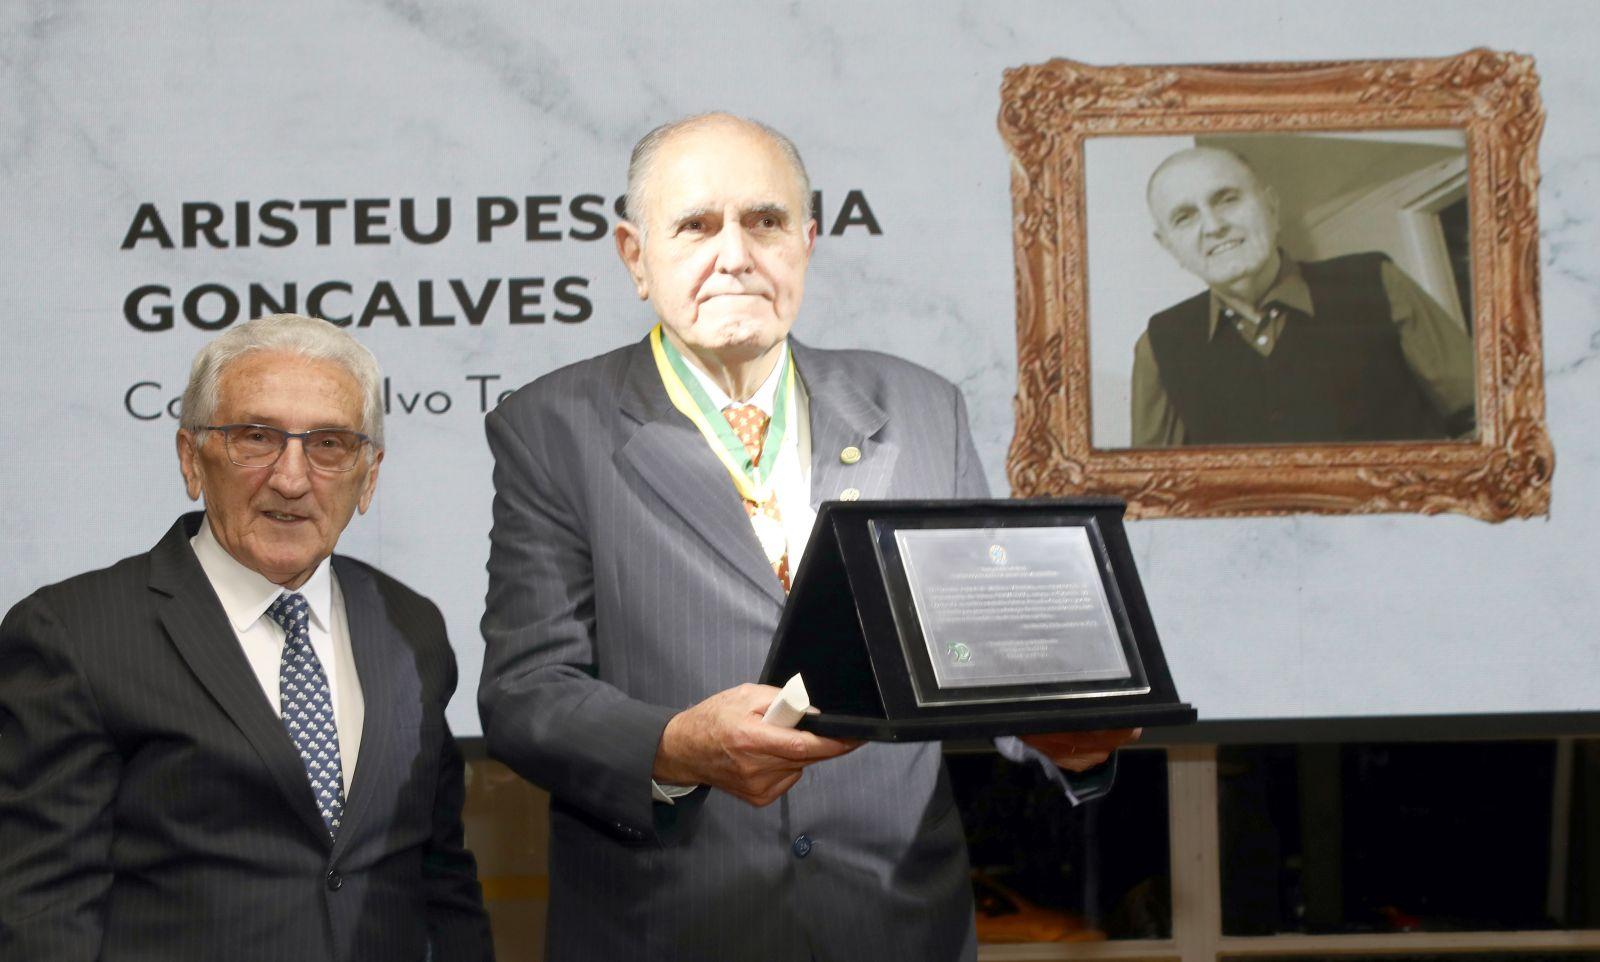 Aristeu Pessanha Gonçalves